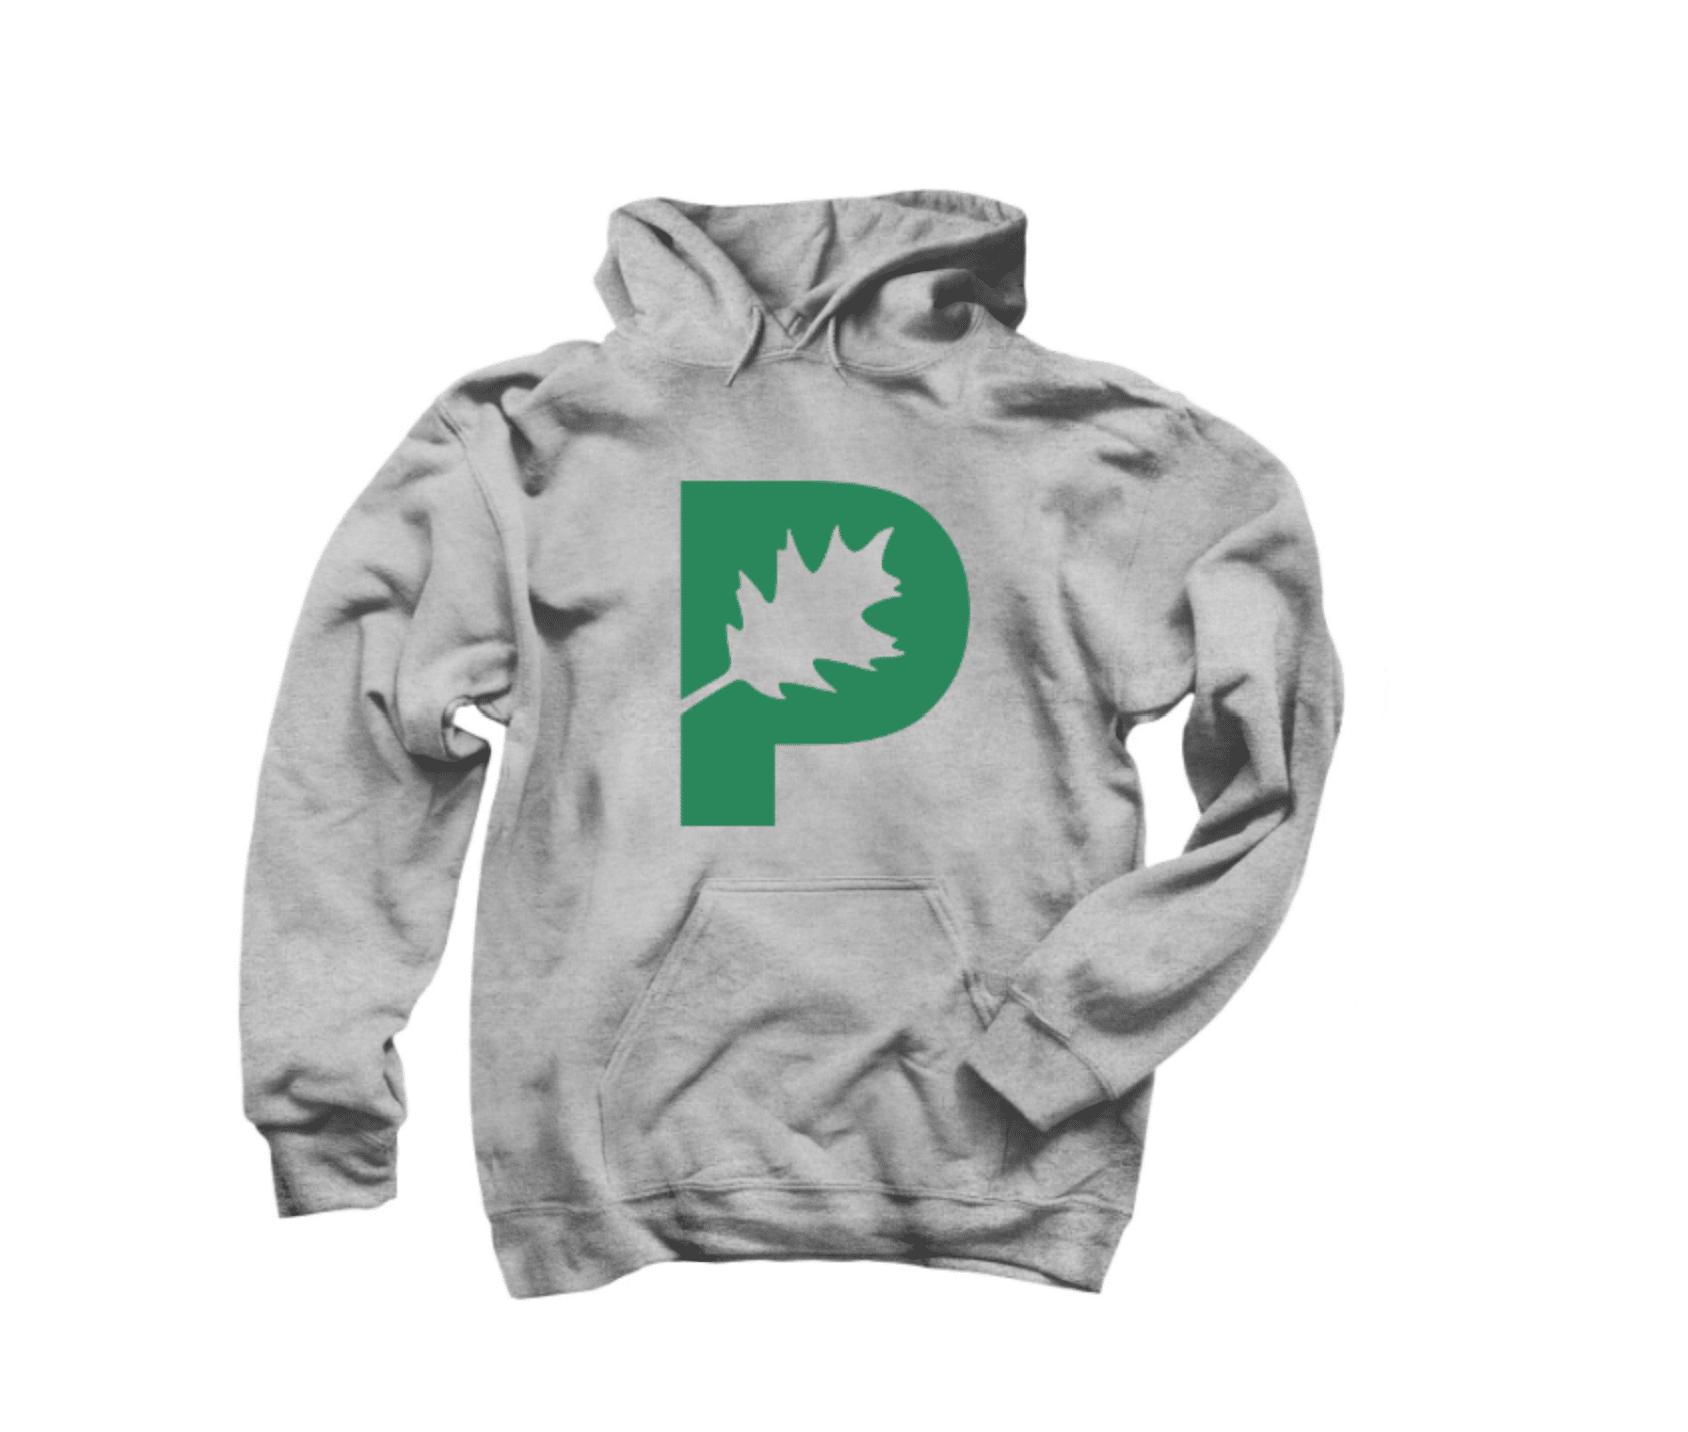 Pittsburgh parks Conservancy hoodie